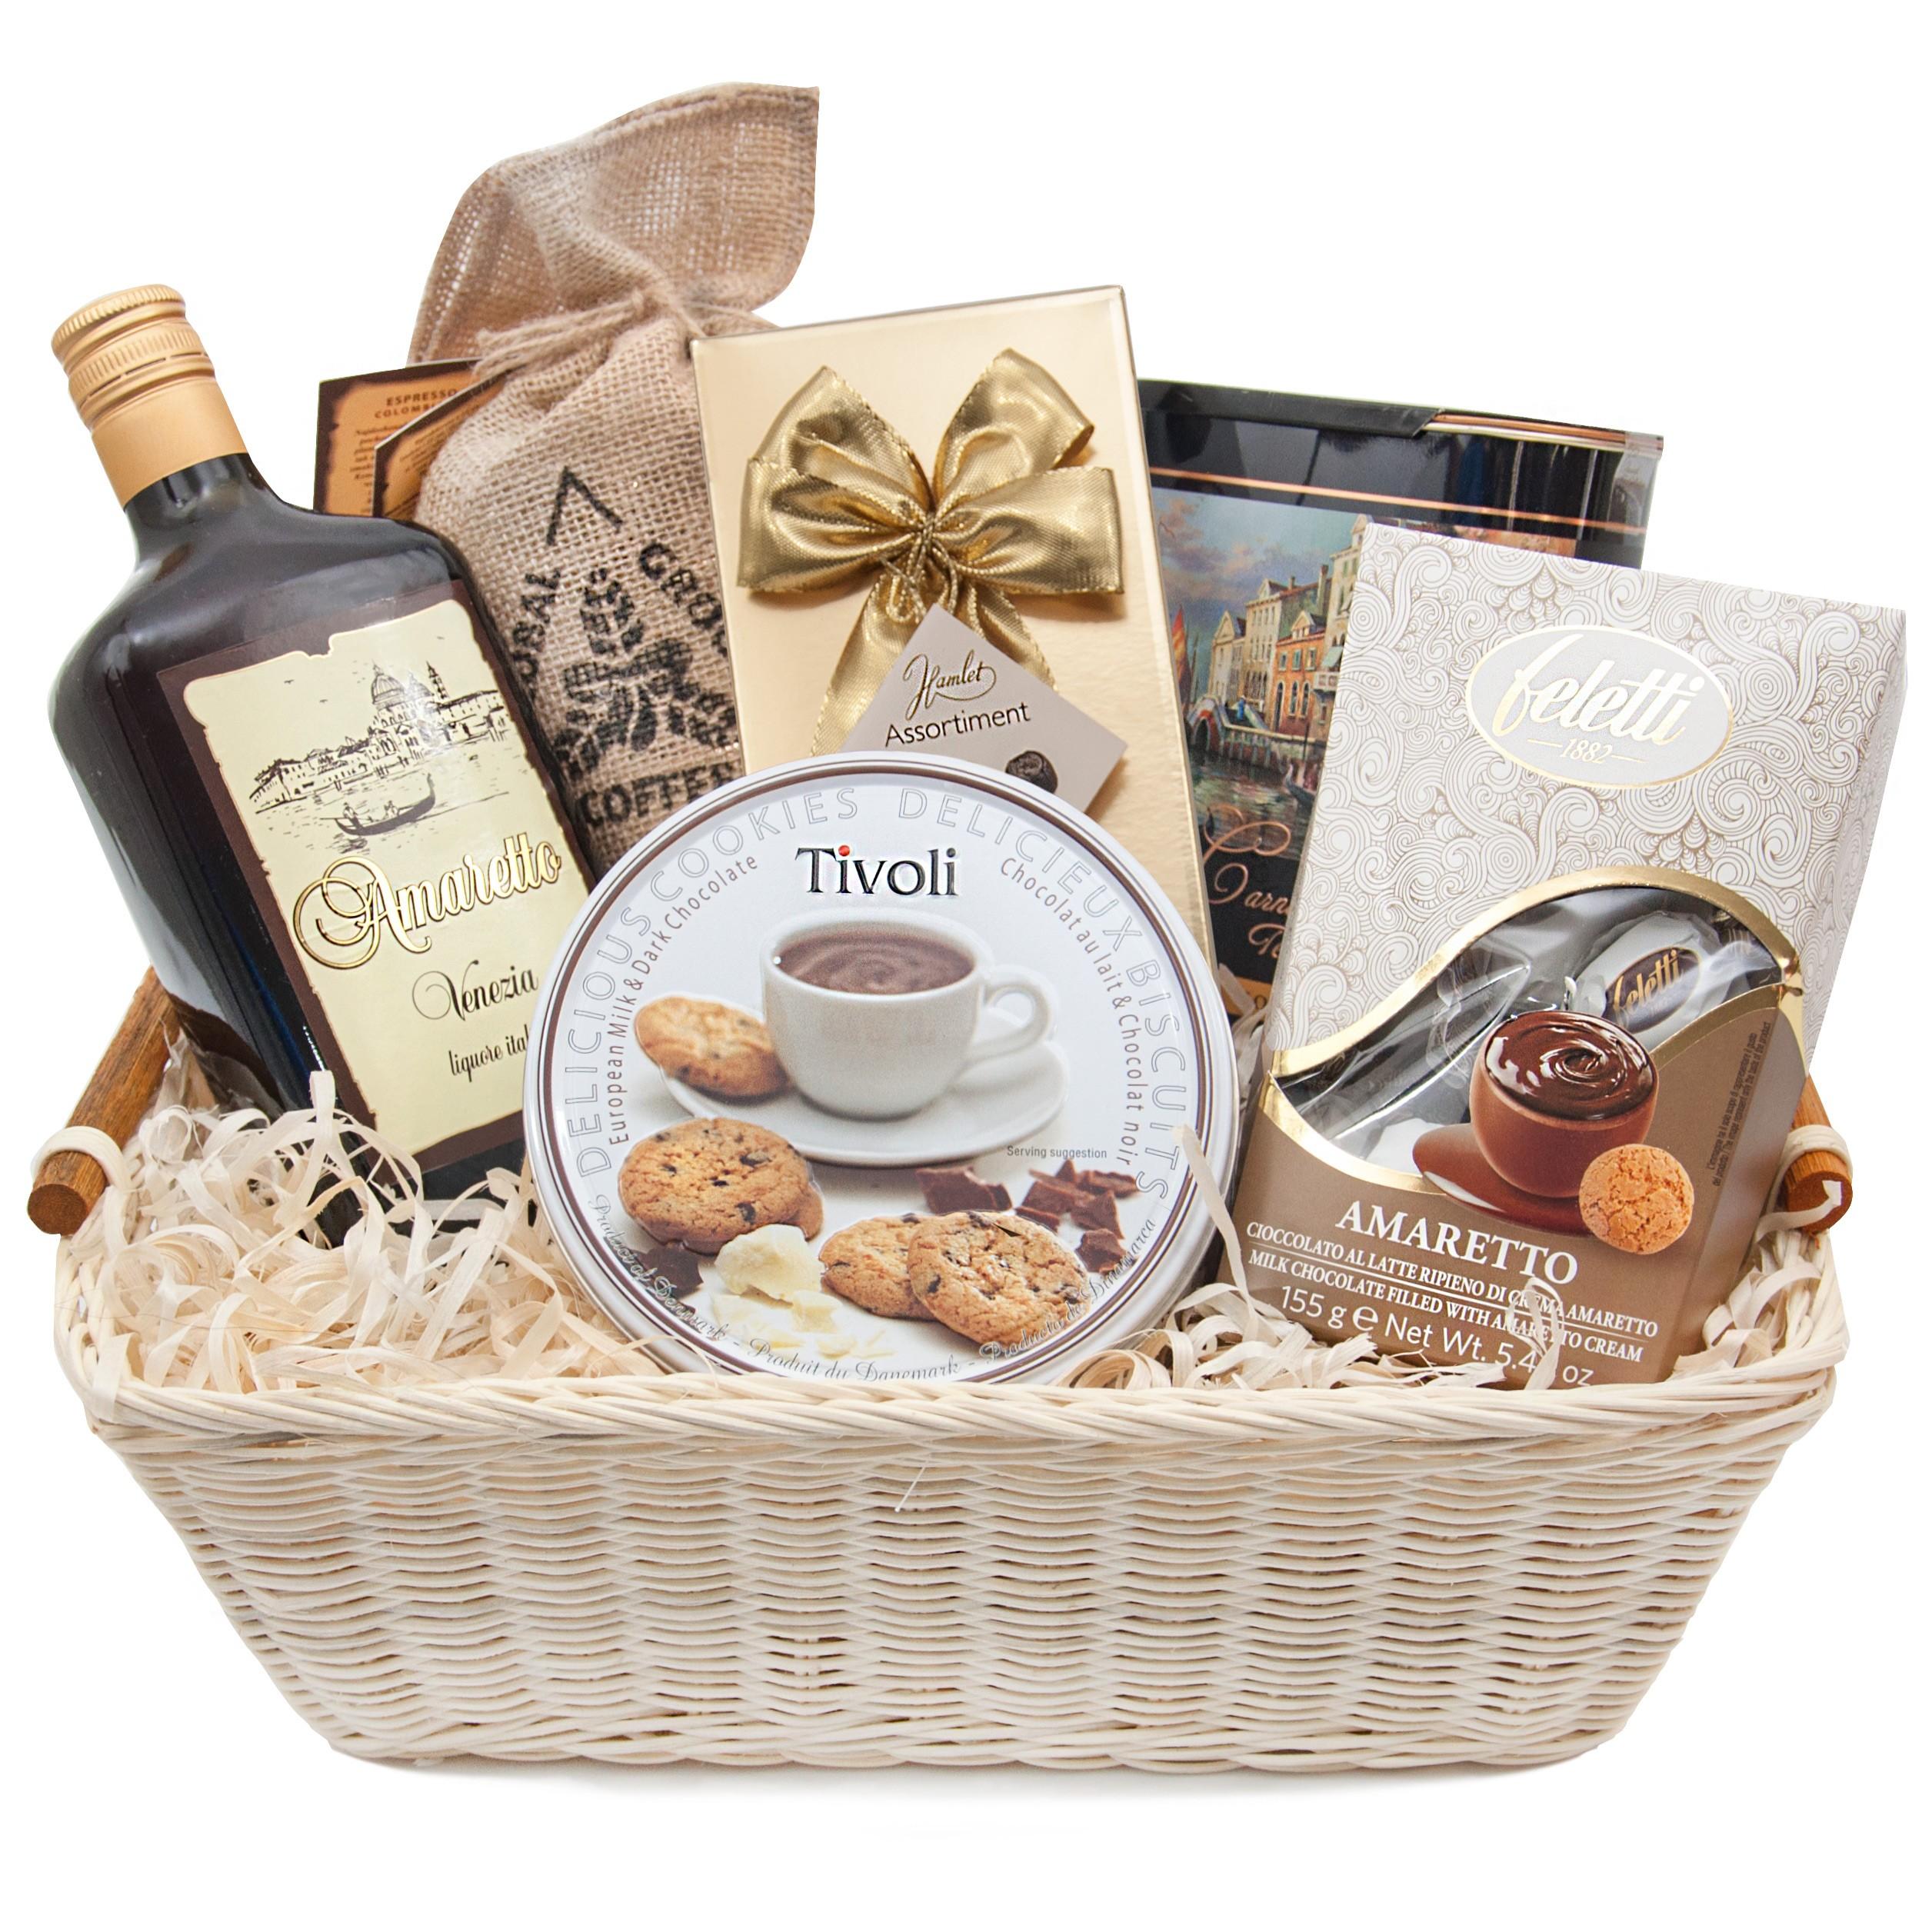 Amaretto basket, Italian Amaretto liqueur with coffee and tea in a wicker basket